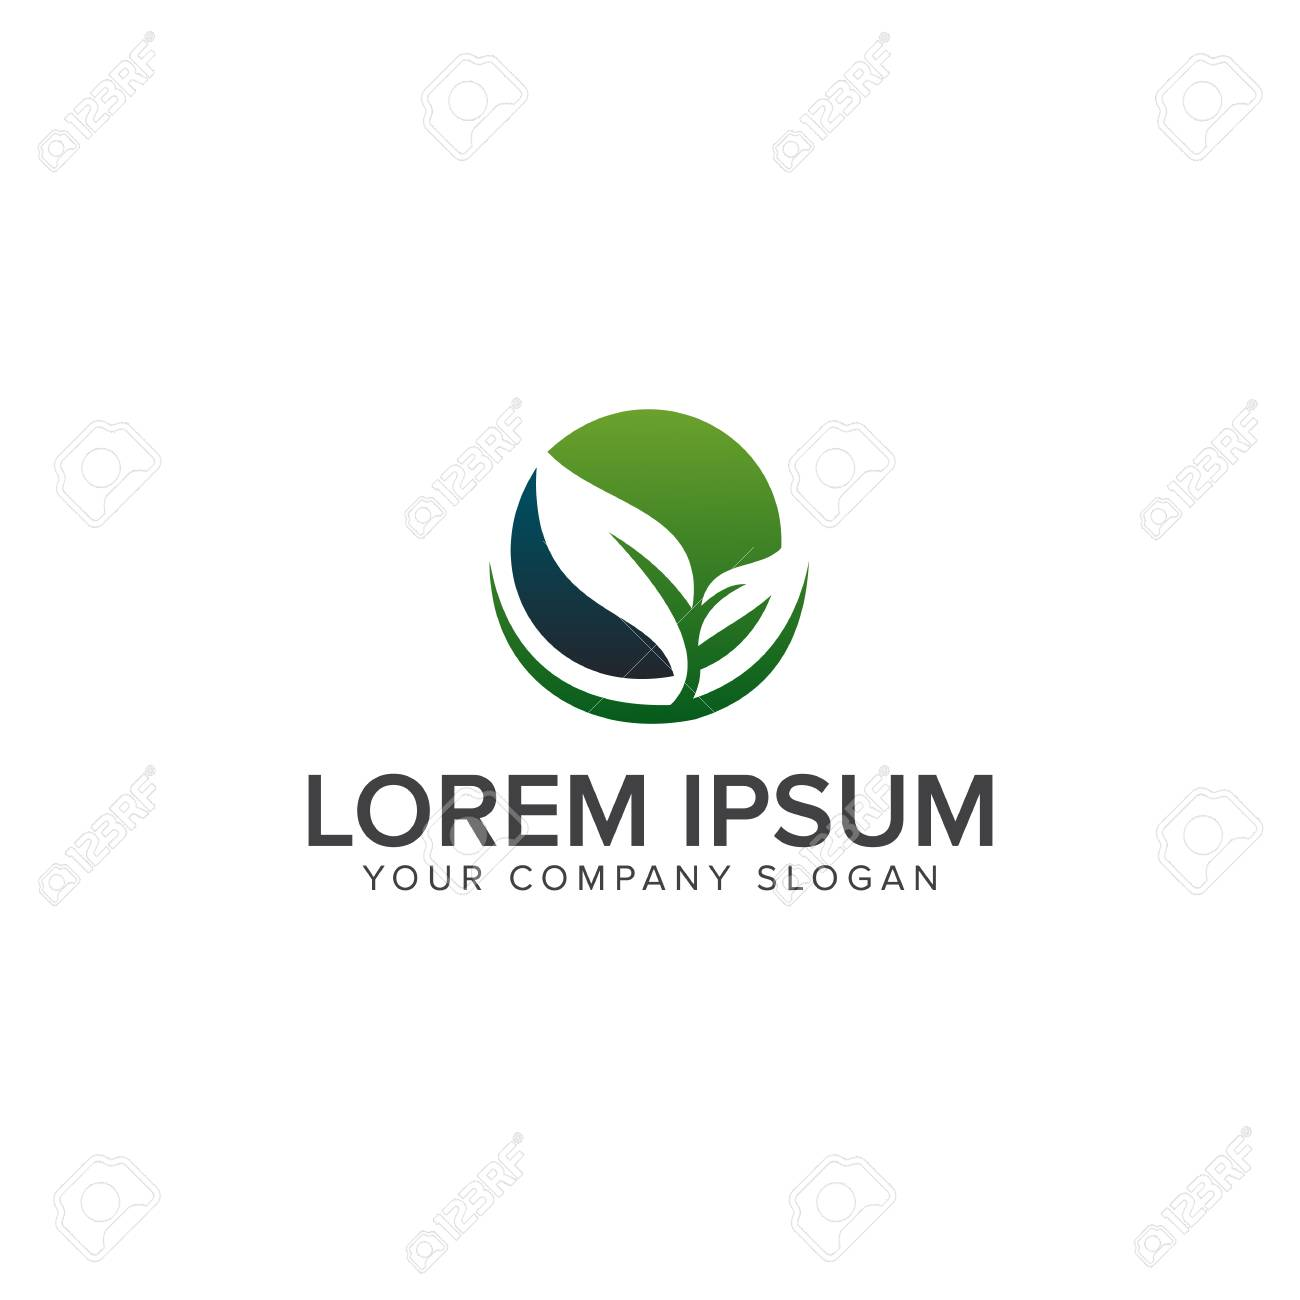 leaf eco green logo design concept template - 82073421